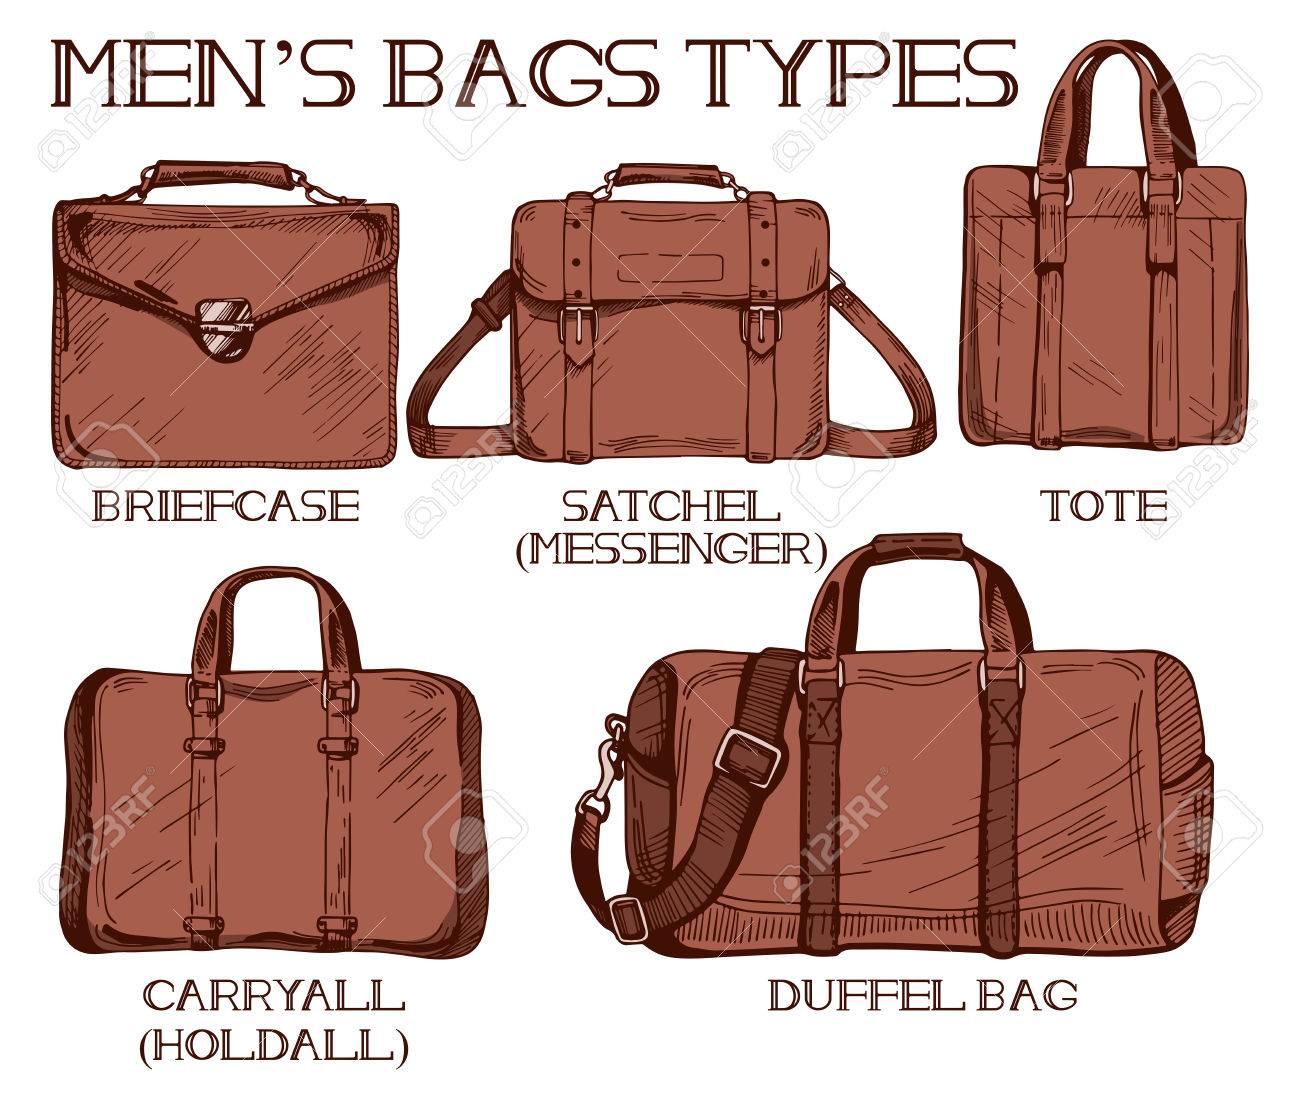 bastante agradable ebf49 0eff8 Ilustración vectorial de bolsas para hombre tipos: maletín, mochila o  messenger, tote, carryall de bolso de mano y bolso de mano. Estilo de  dibujo ...